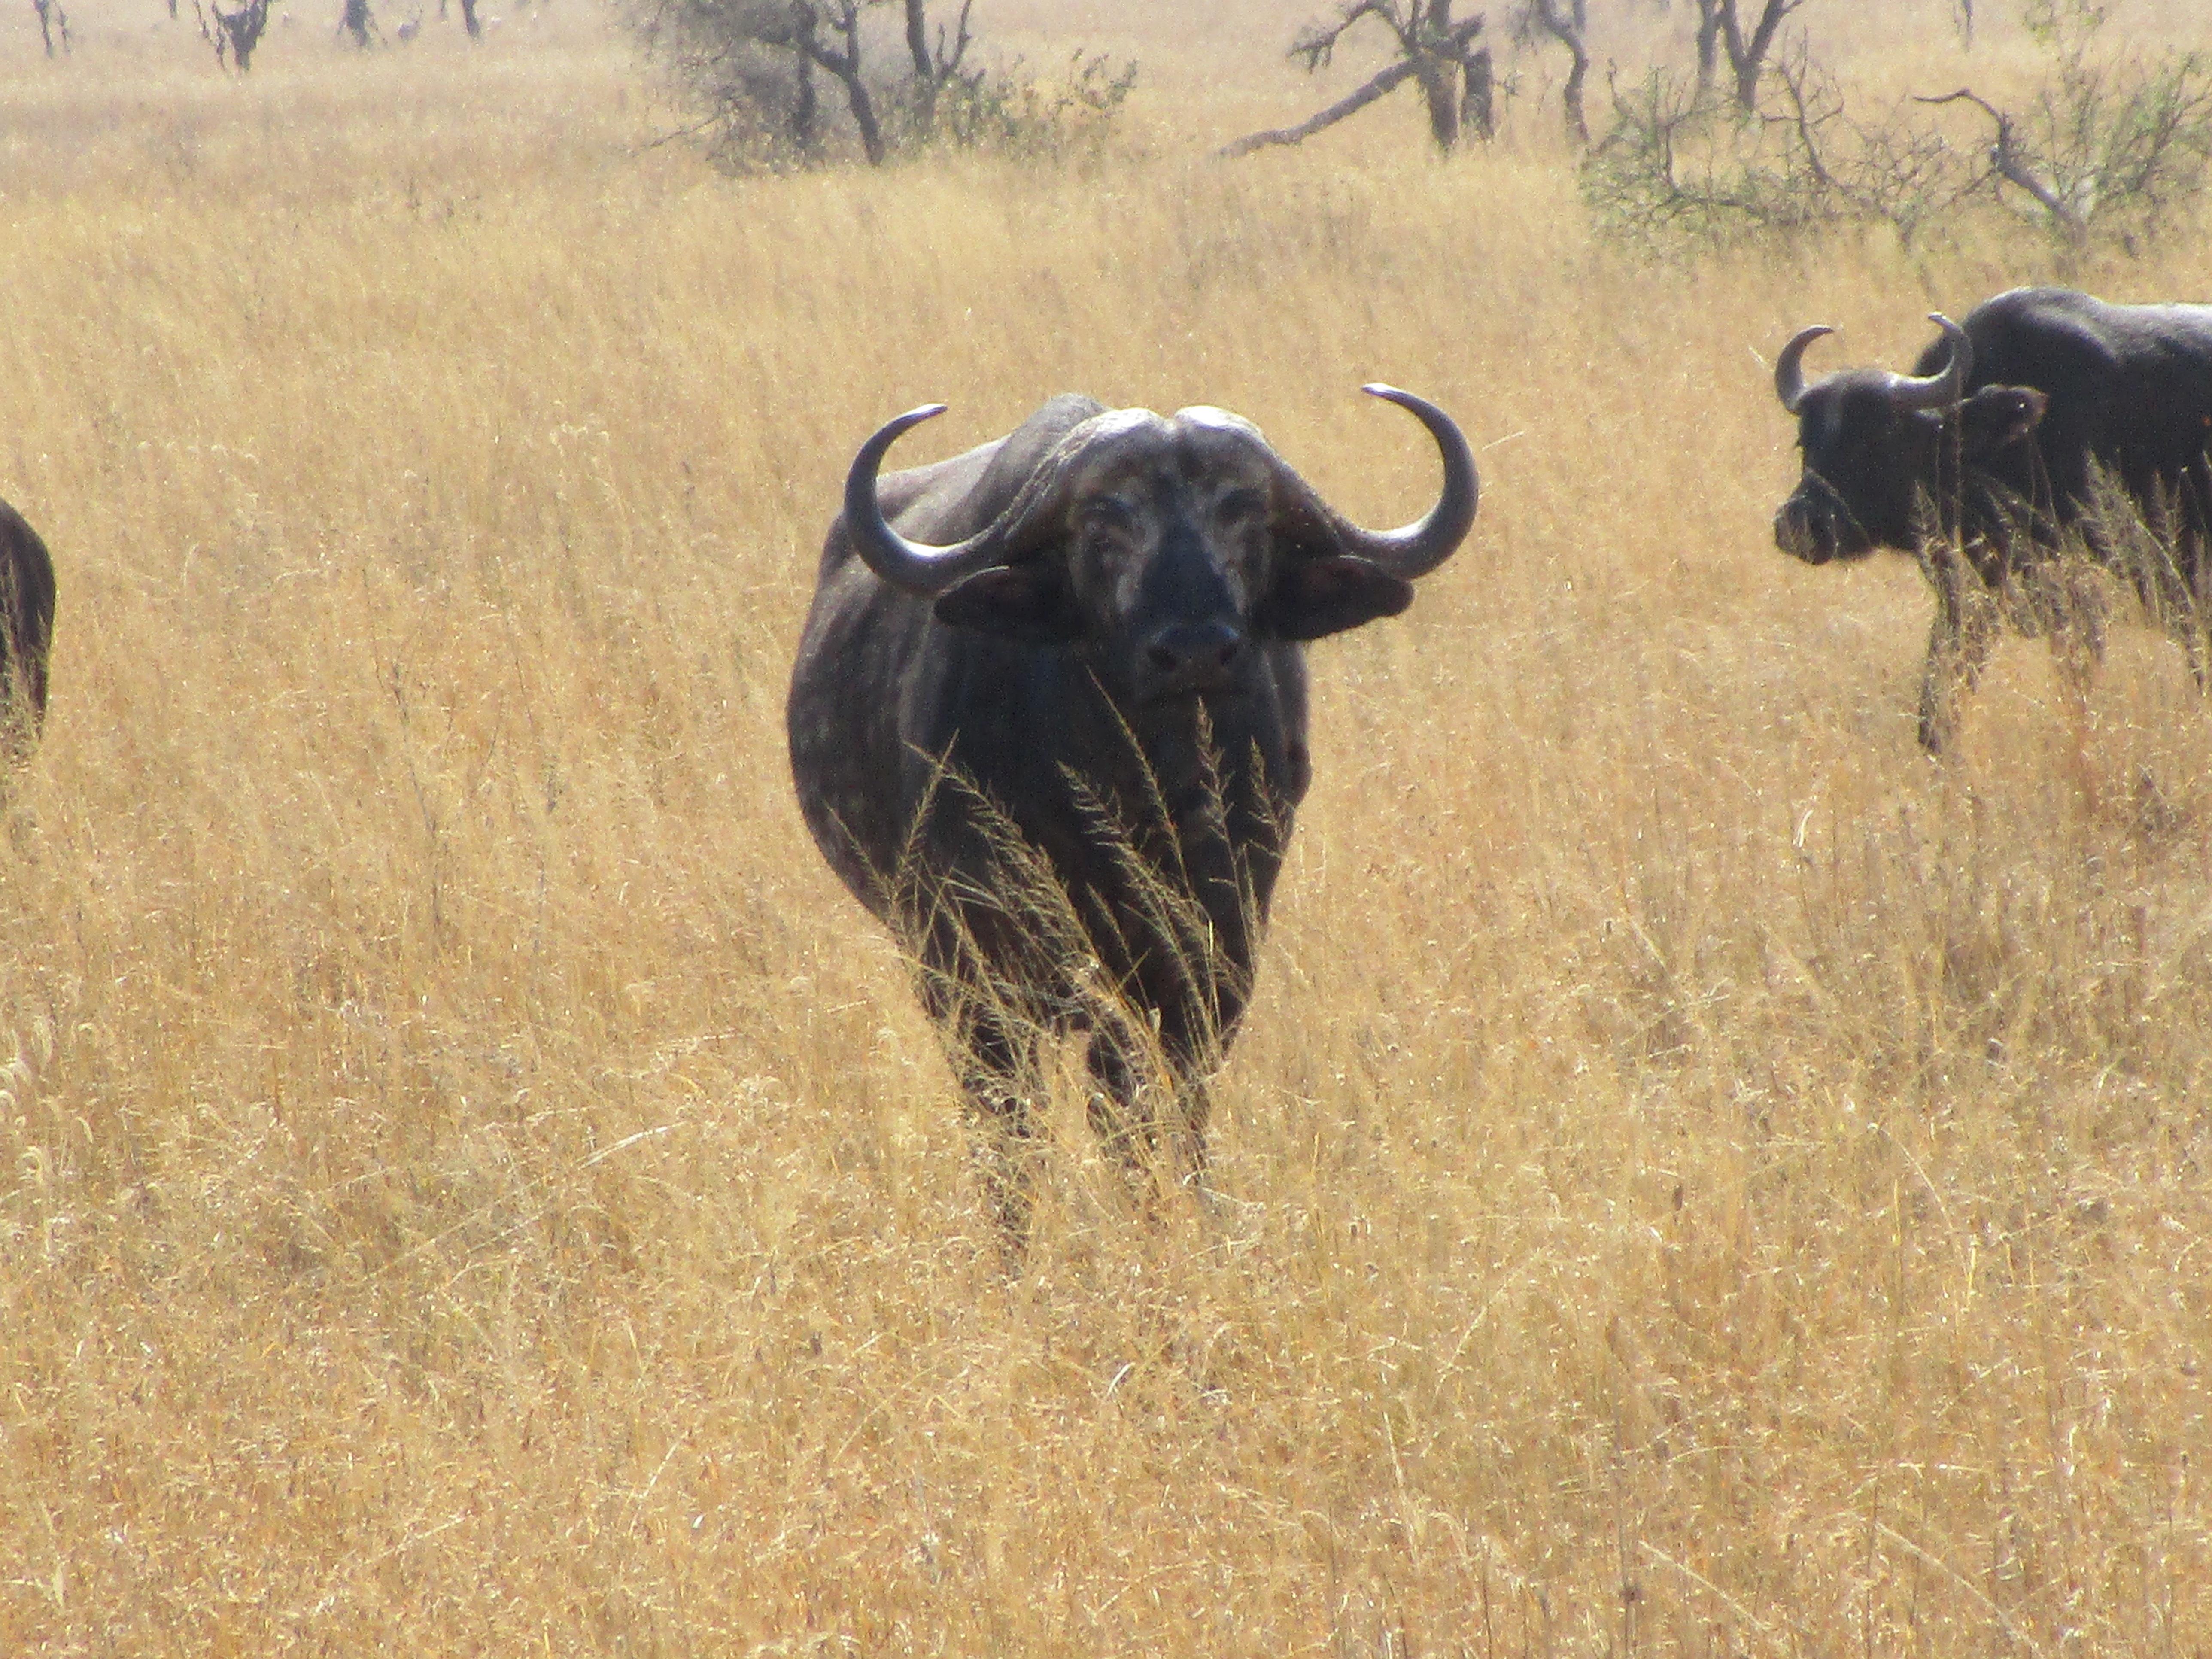 Water Buffalo Serengeti National Park